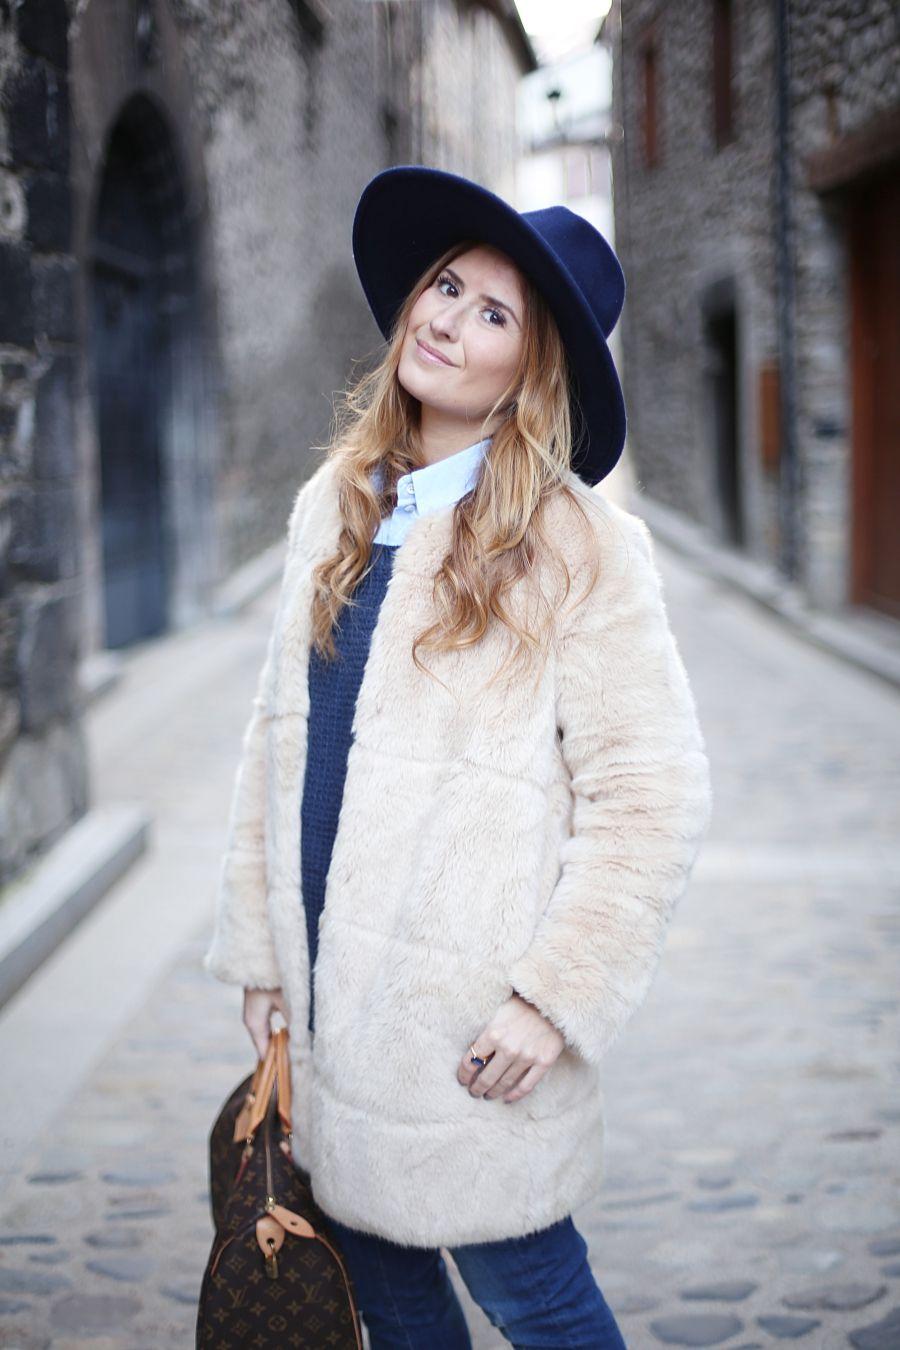 Comfy Outfit. Look con abrigo de pelo. A trendy life.  casual  comfy  denim   jeans  sneakers  hat  abrigopelo  details  superdry  levis  zara   louisvuitton ... 05fc922b0bc